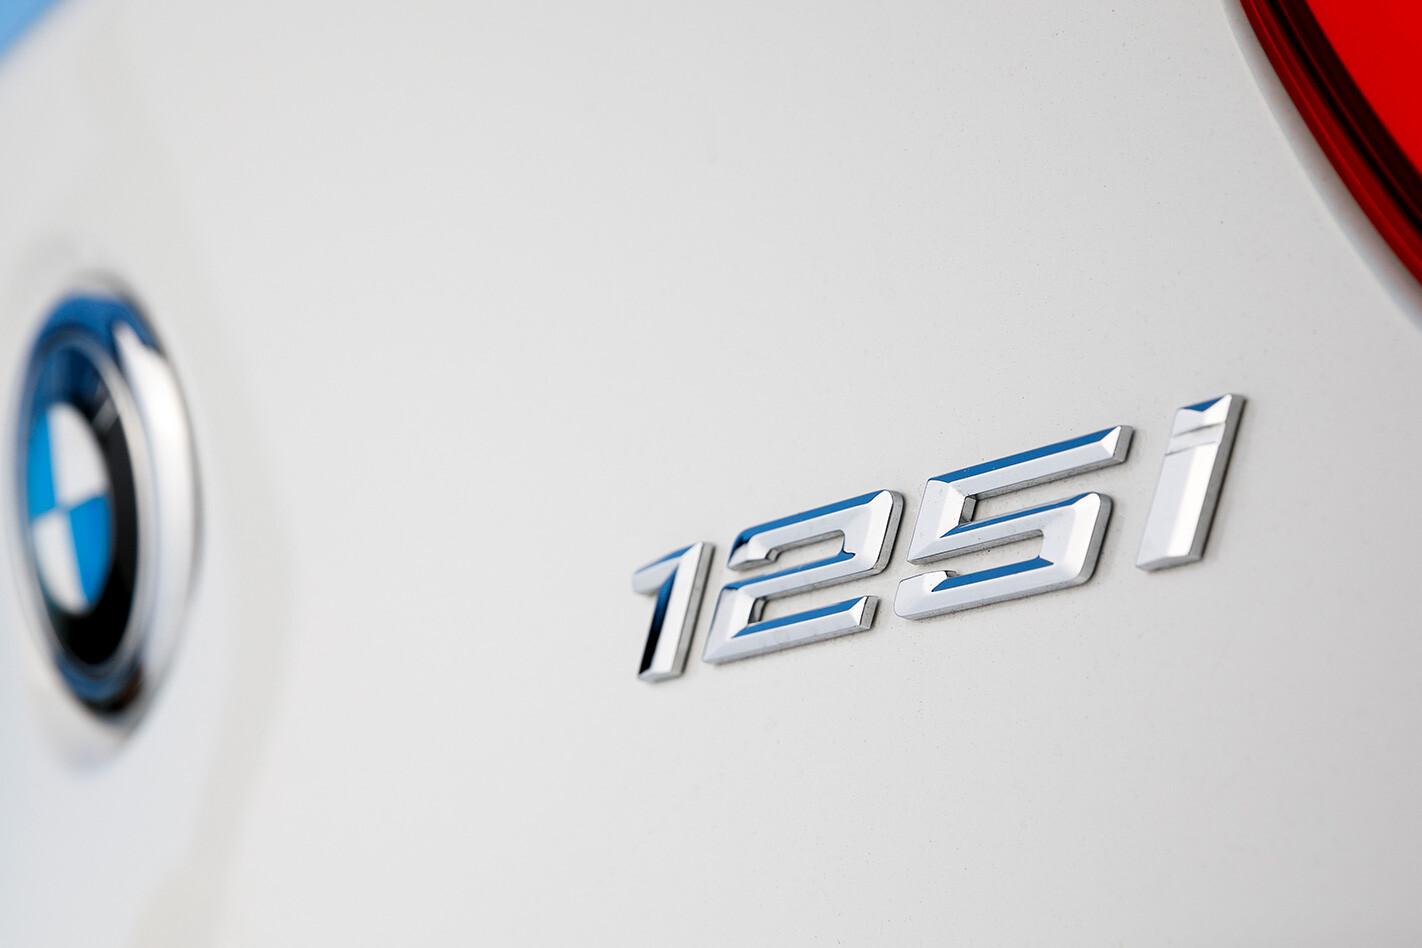 Bmw 125 I Badge Jpg